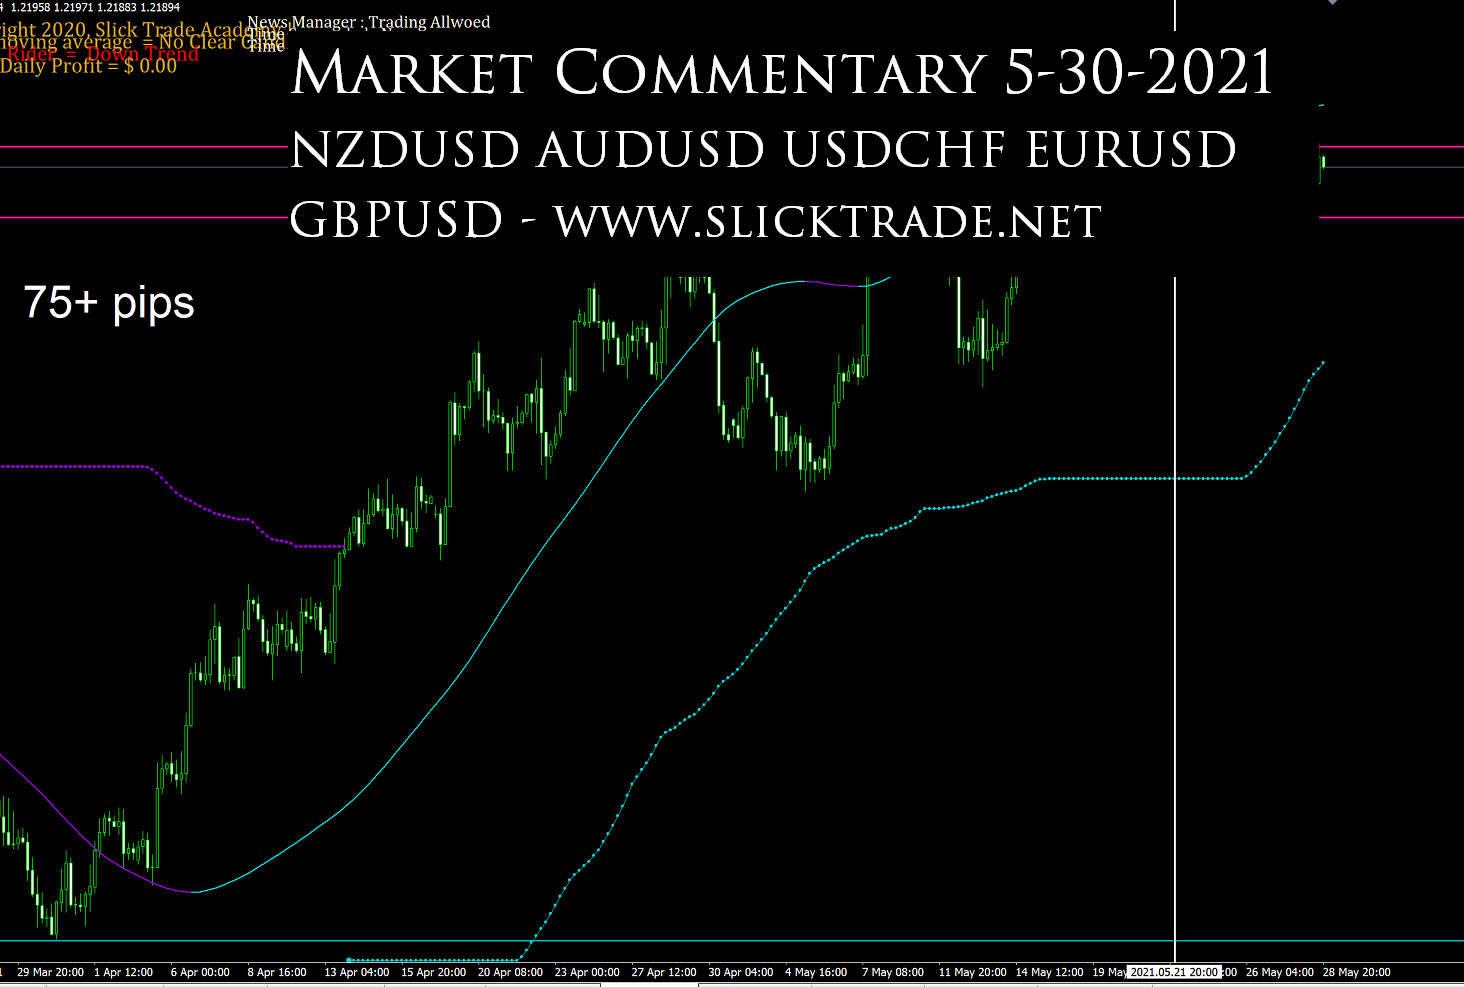 Market Commentary 5-30-2021 - NZDUSD AUDUSD USDCHF EURUSD GBPUSD